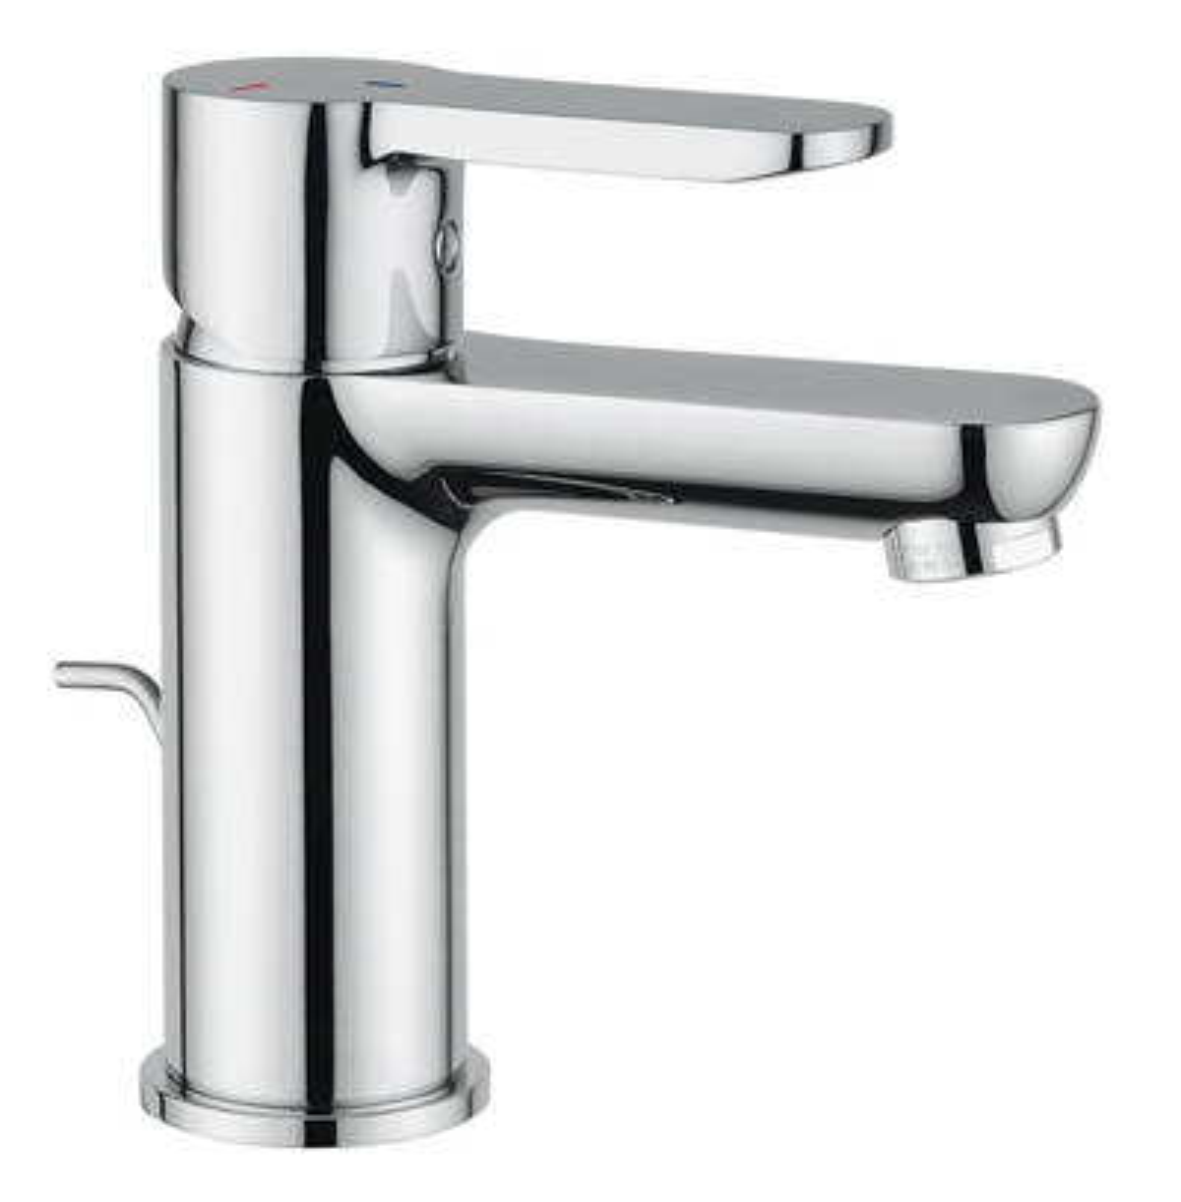 Mitigeur lavabo Kali - C3 Aquance